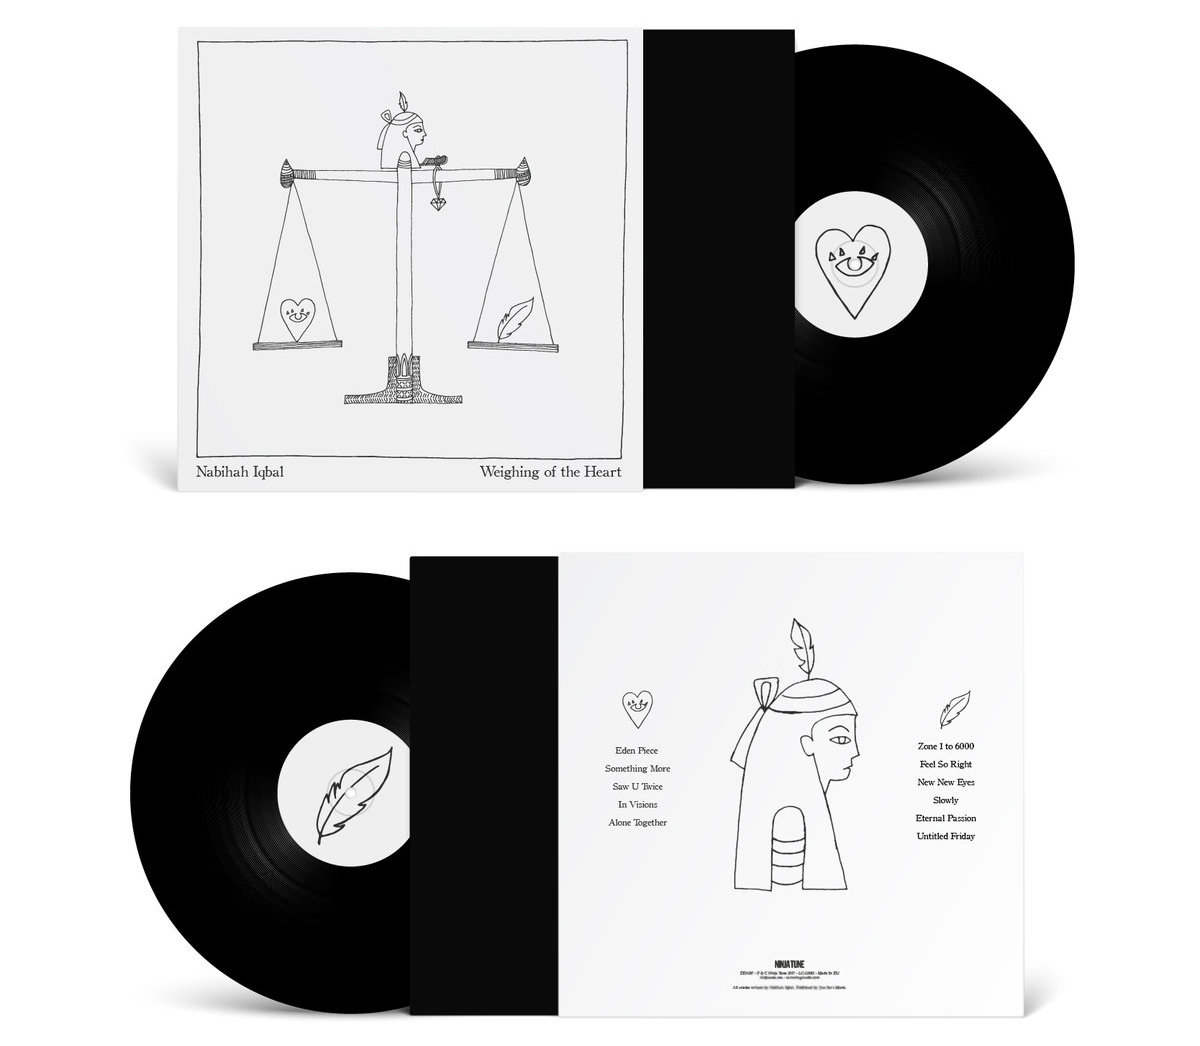 Nabihah Iqbal | Weighing of the Heart vinyl